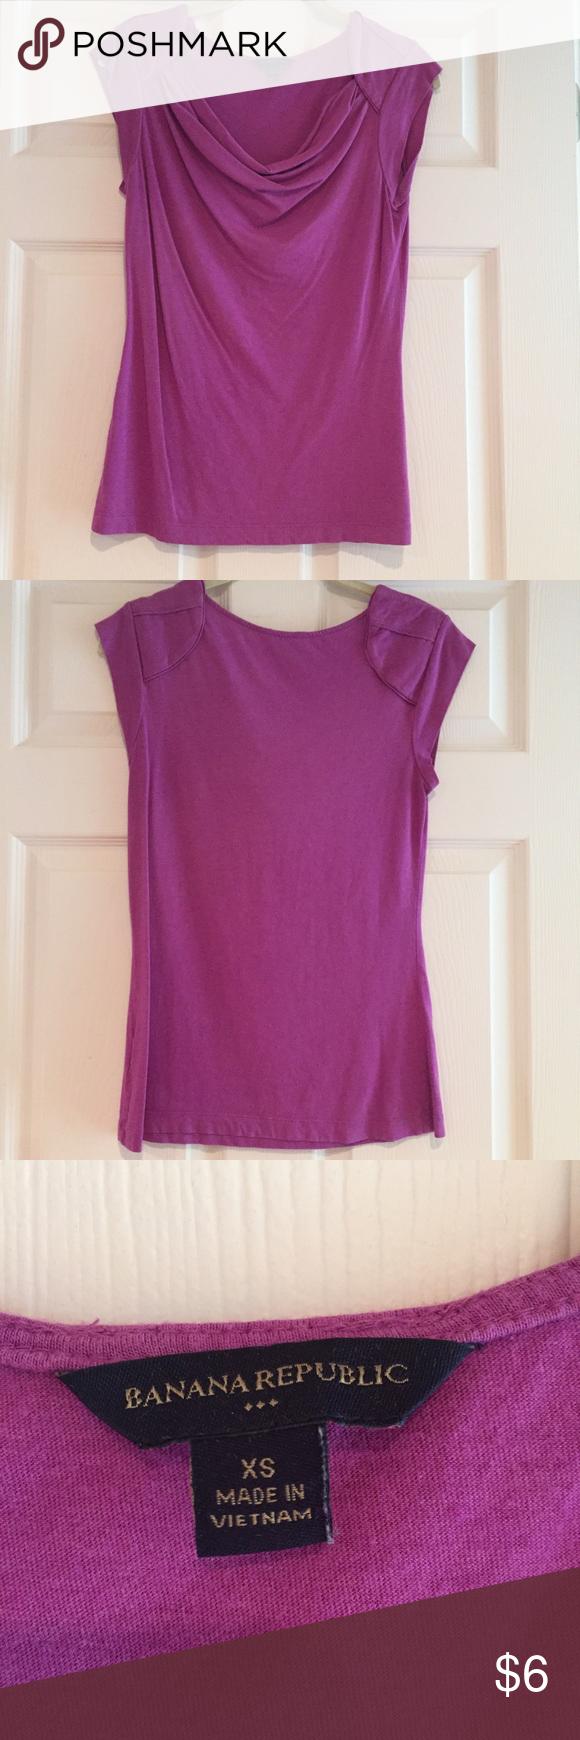 Banana Republic Short Sleeve Shirt Purple boat neck short sleeve shirt Banana Republic Tops Tees - Short Sleeve